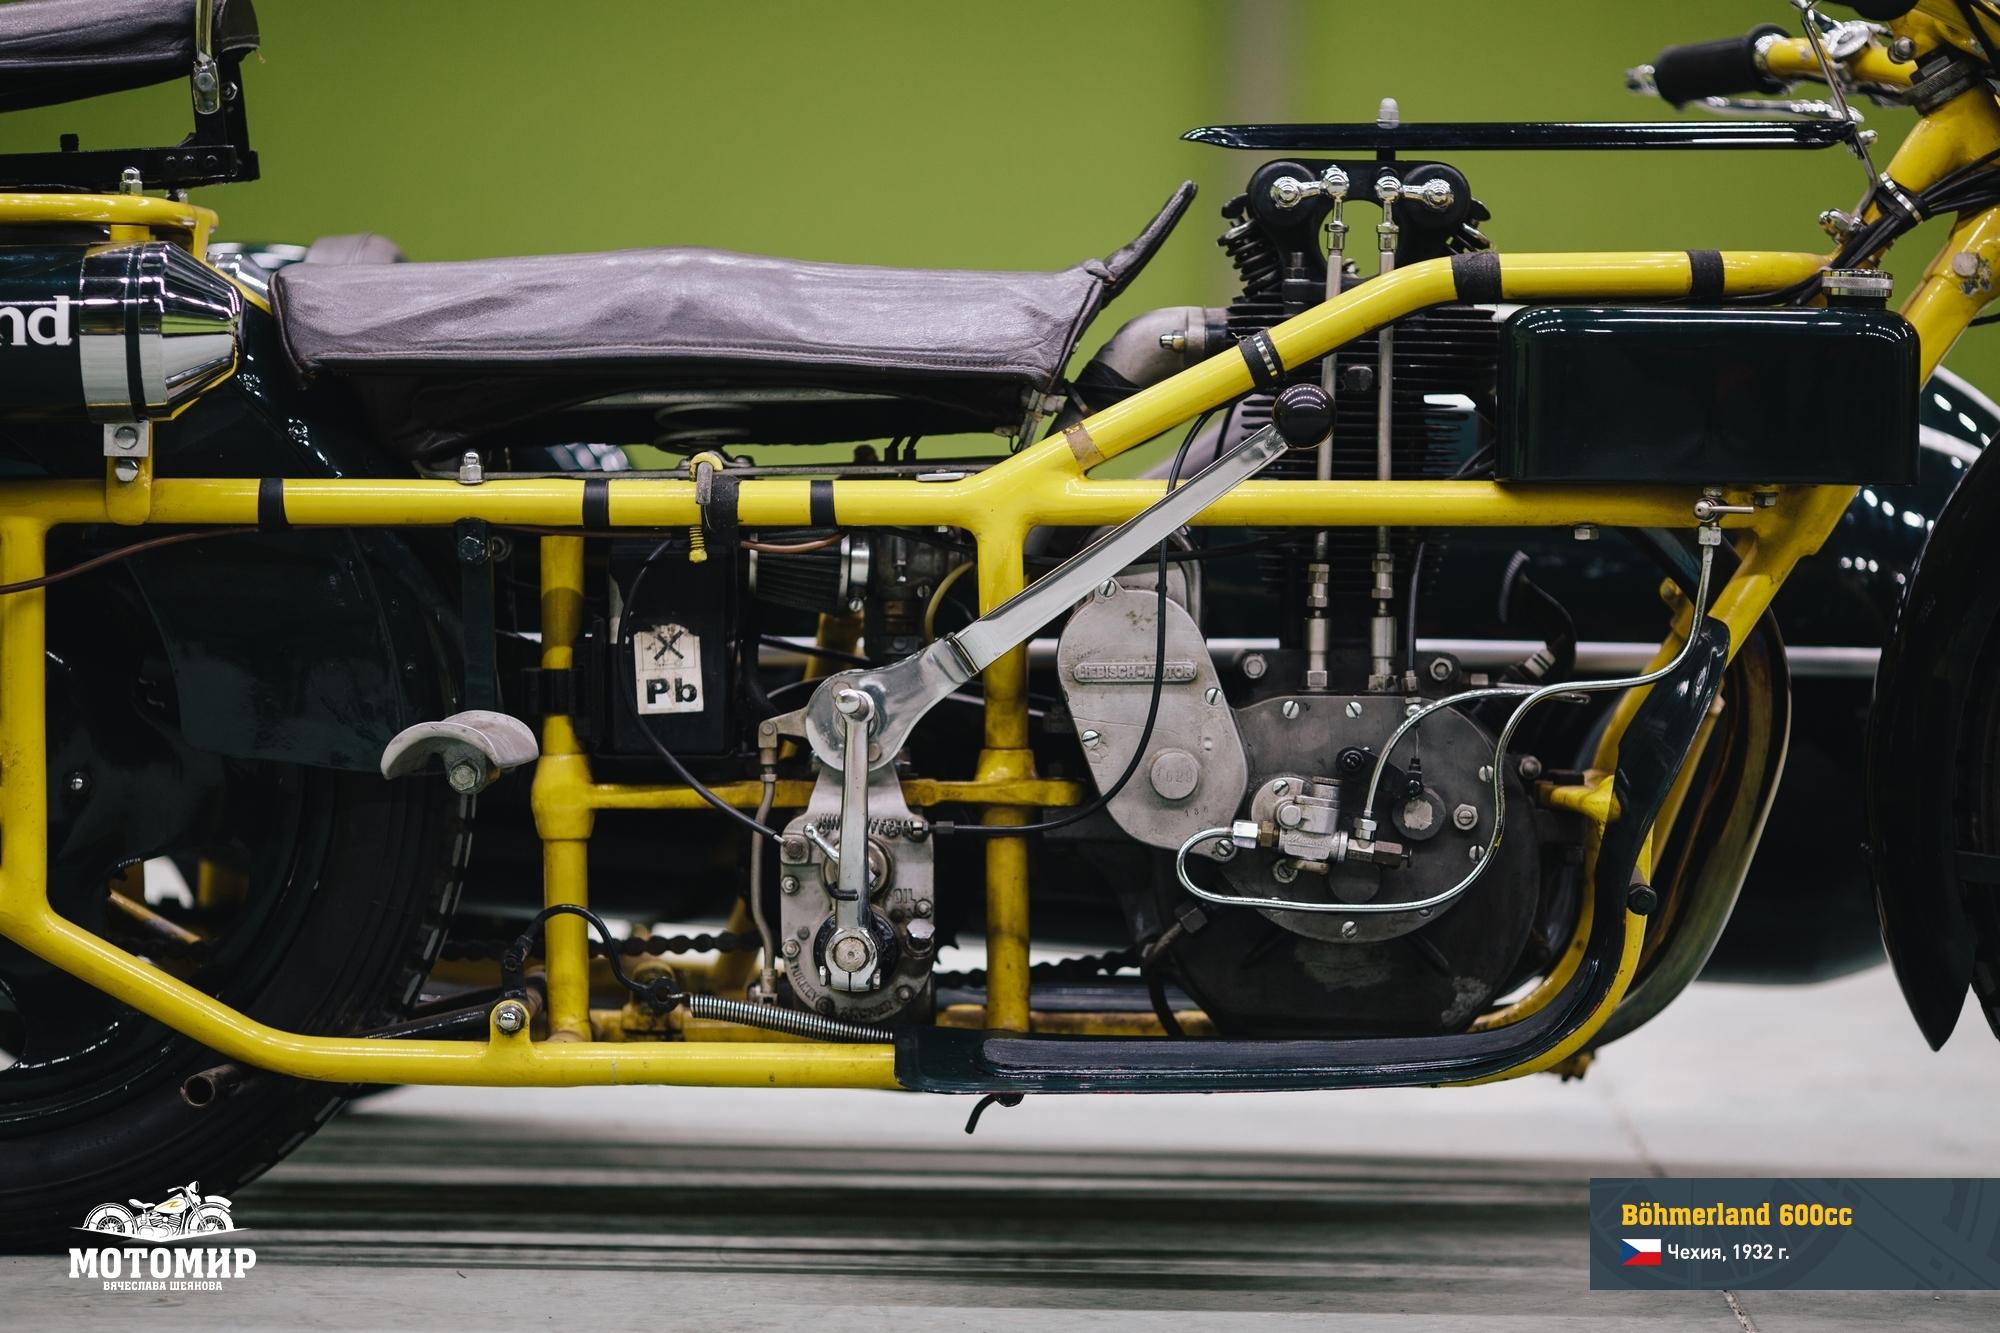 bohmerland-600cc-201502-web-10